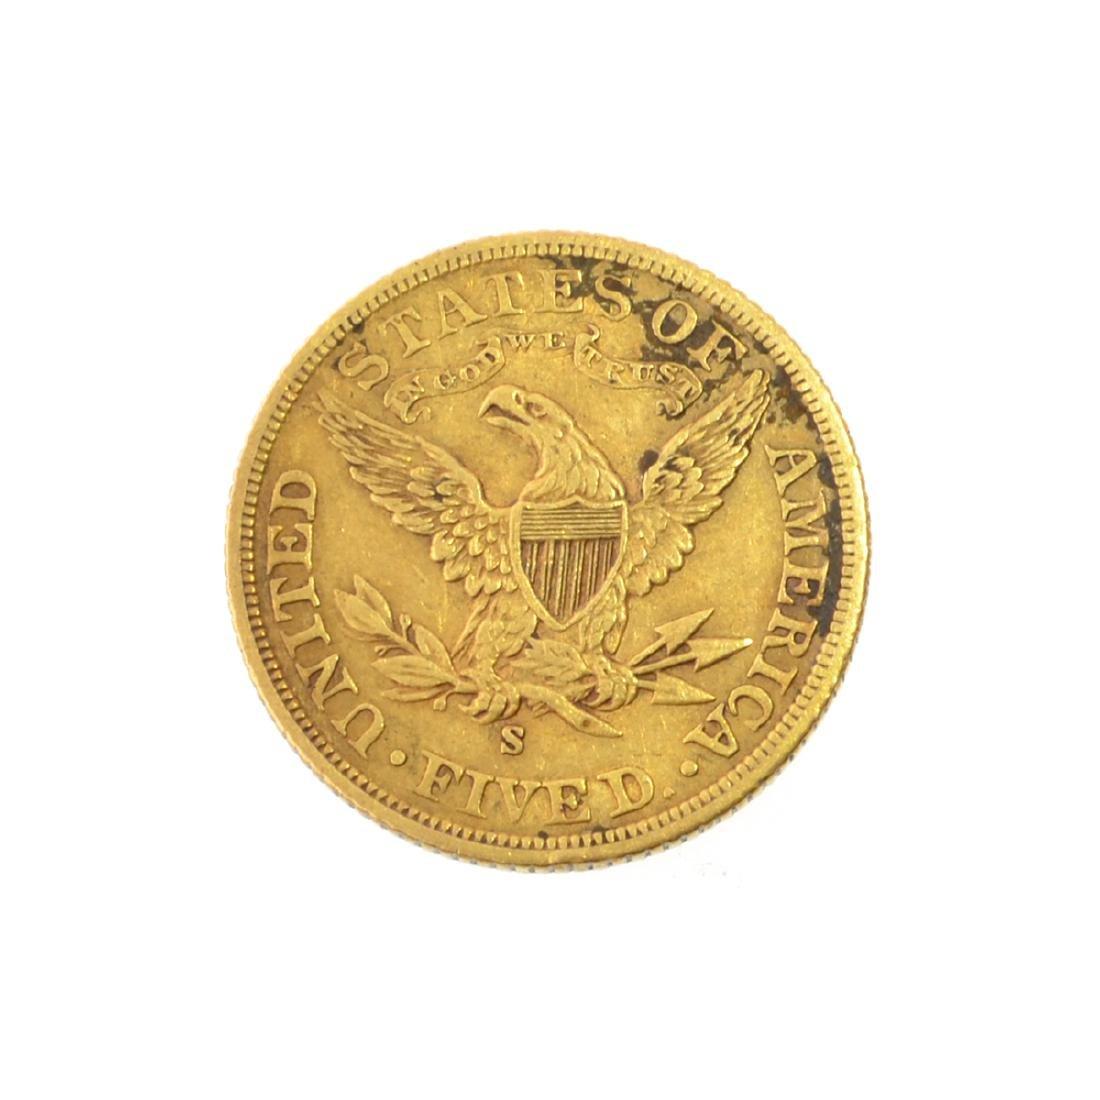 *1902 $5 U.S. Liberty Head Gold Coin (JG-N) - 2